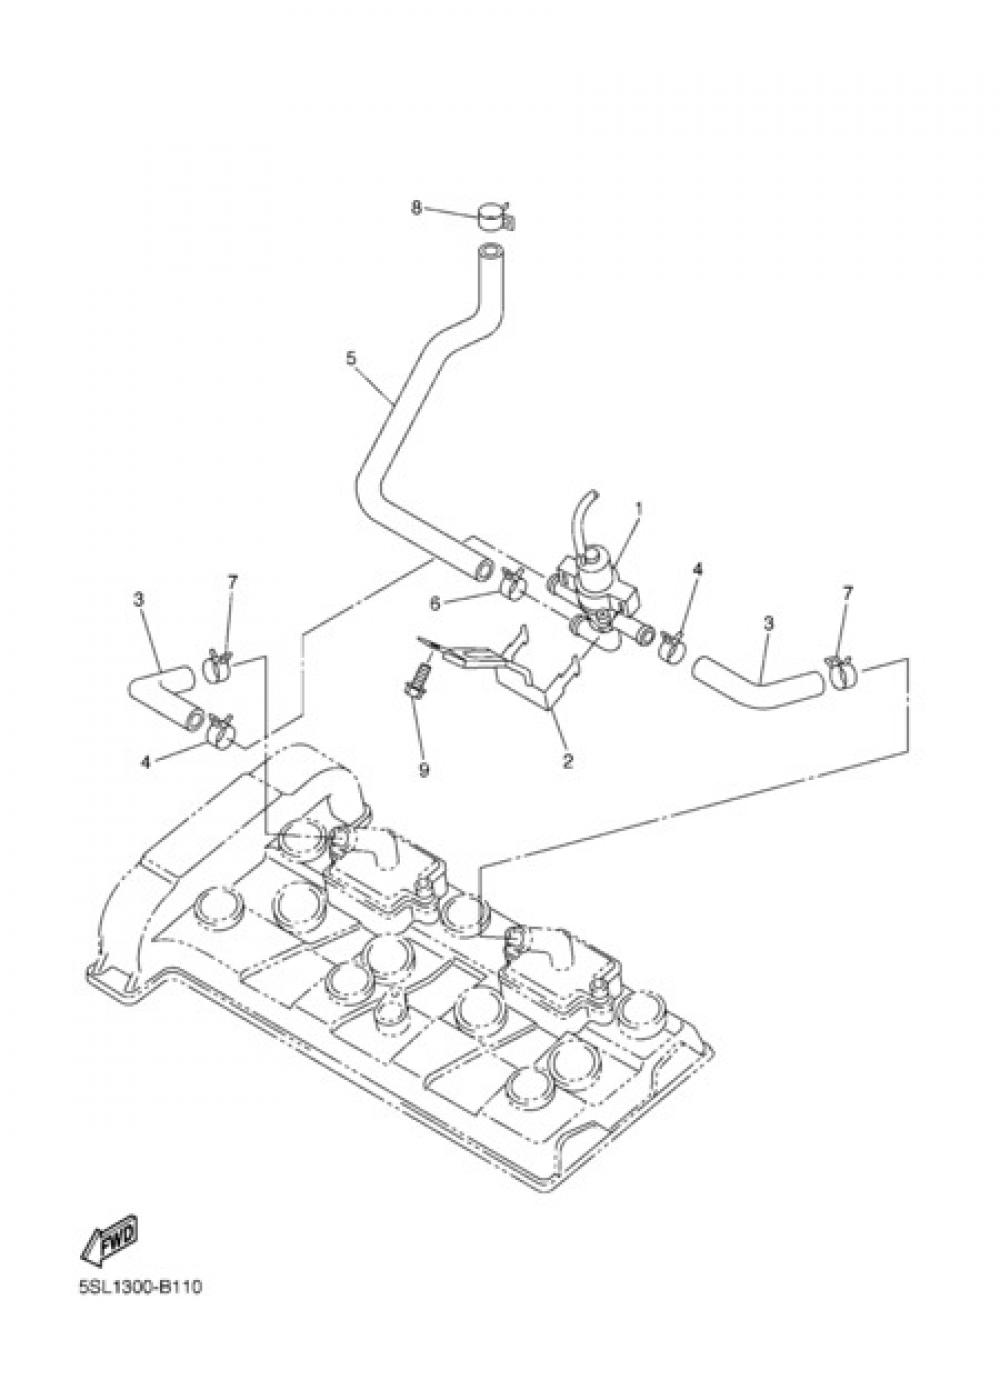 AIR INDUCTION SYSTEM Yamaha YZF-R6 2003